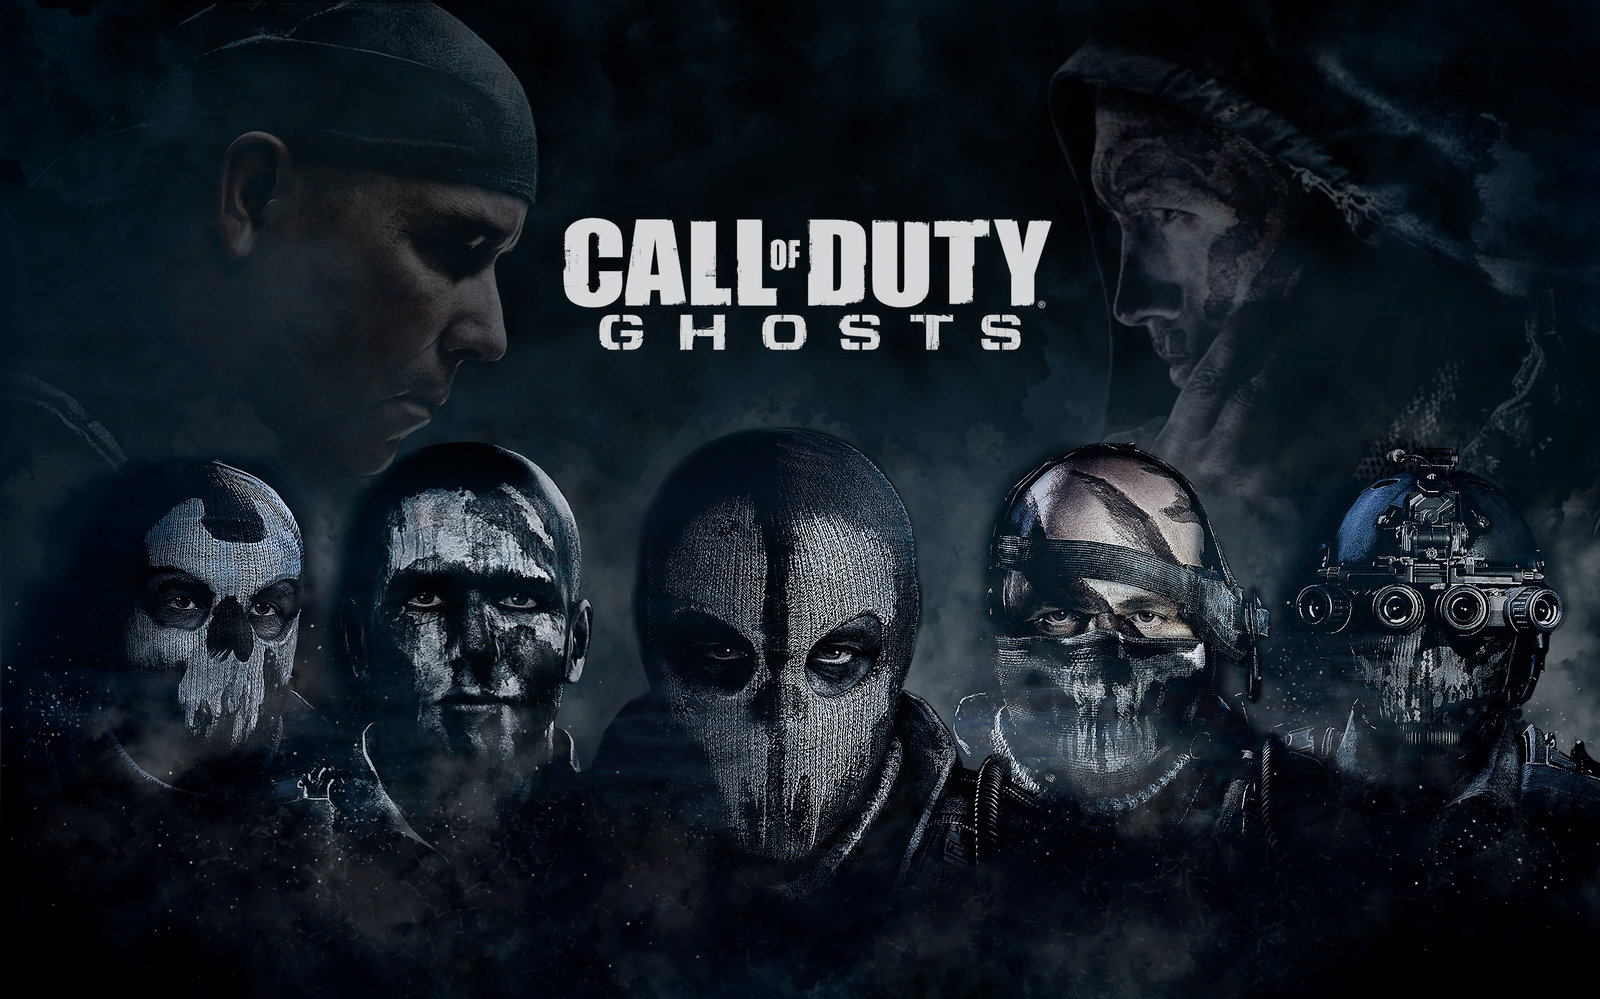 50 Call Of Duty Ghosts Wallpaper On Wallpapersafari